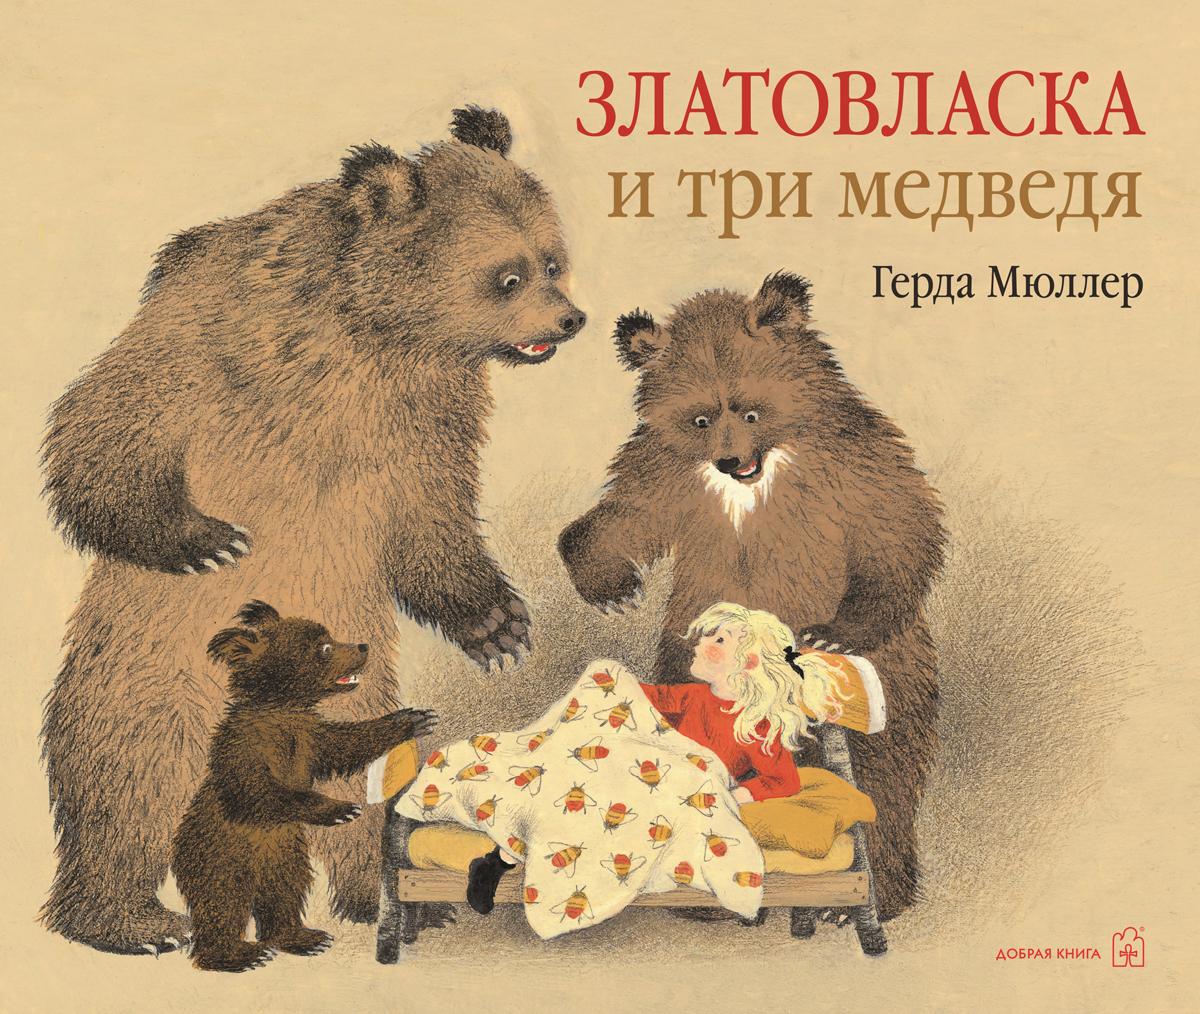 Златовласка и три медведя, Мюллер Герда